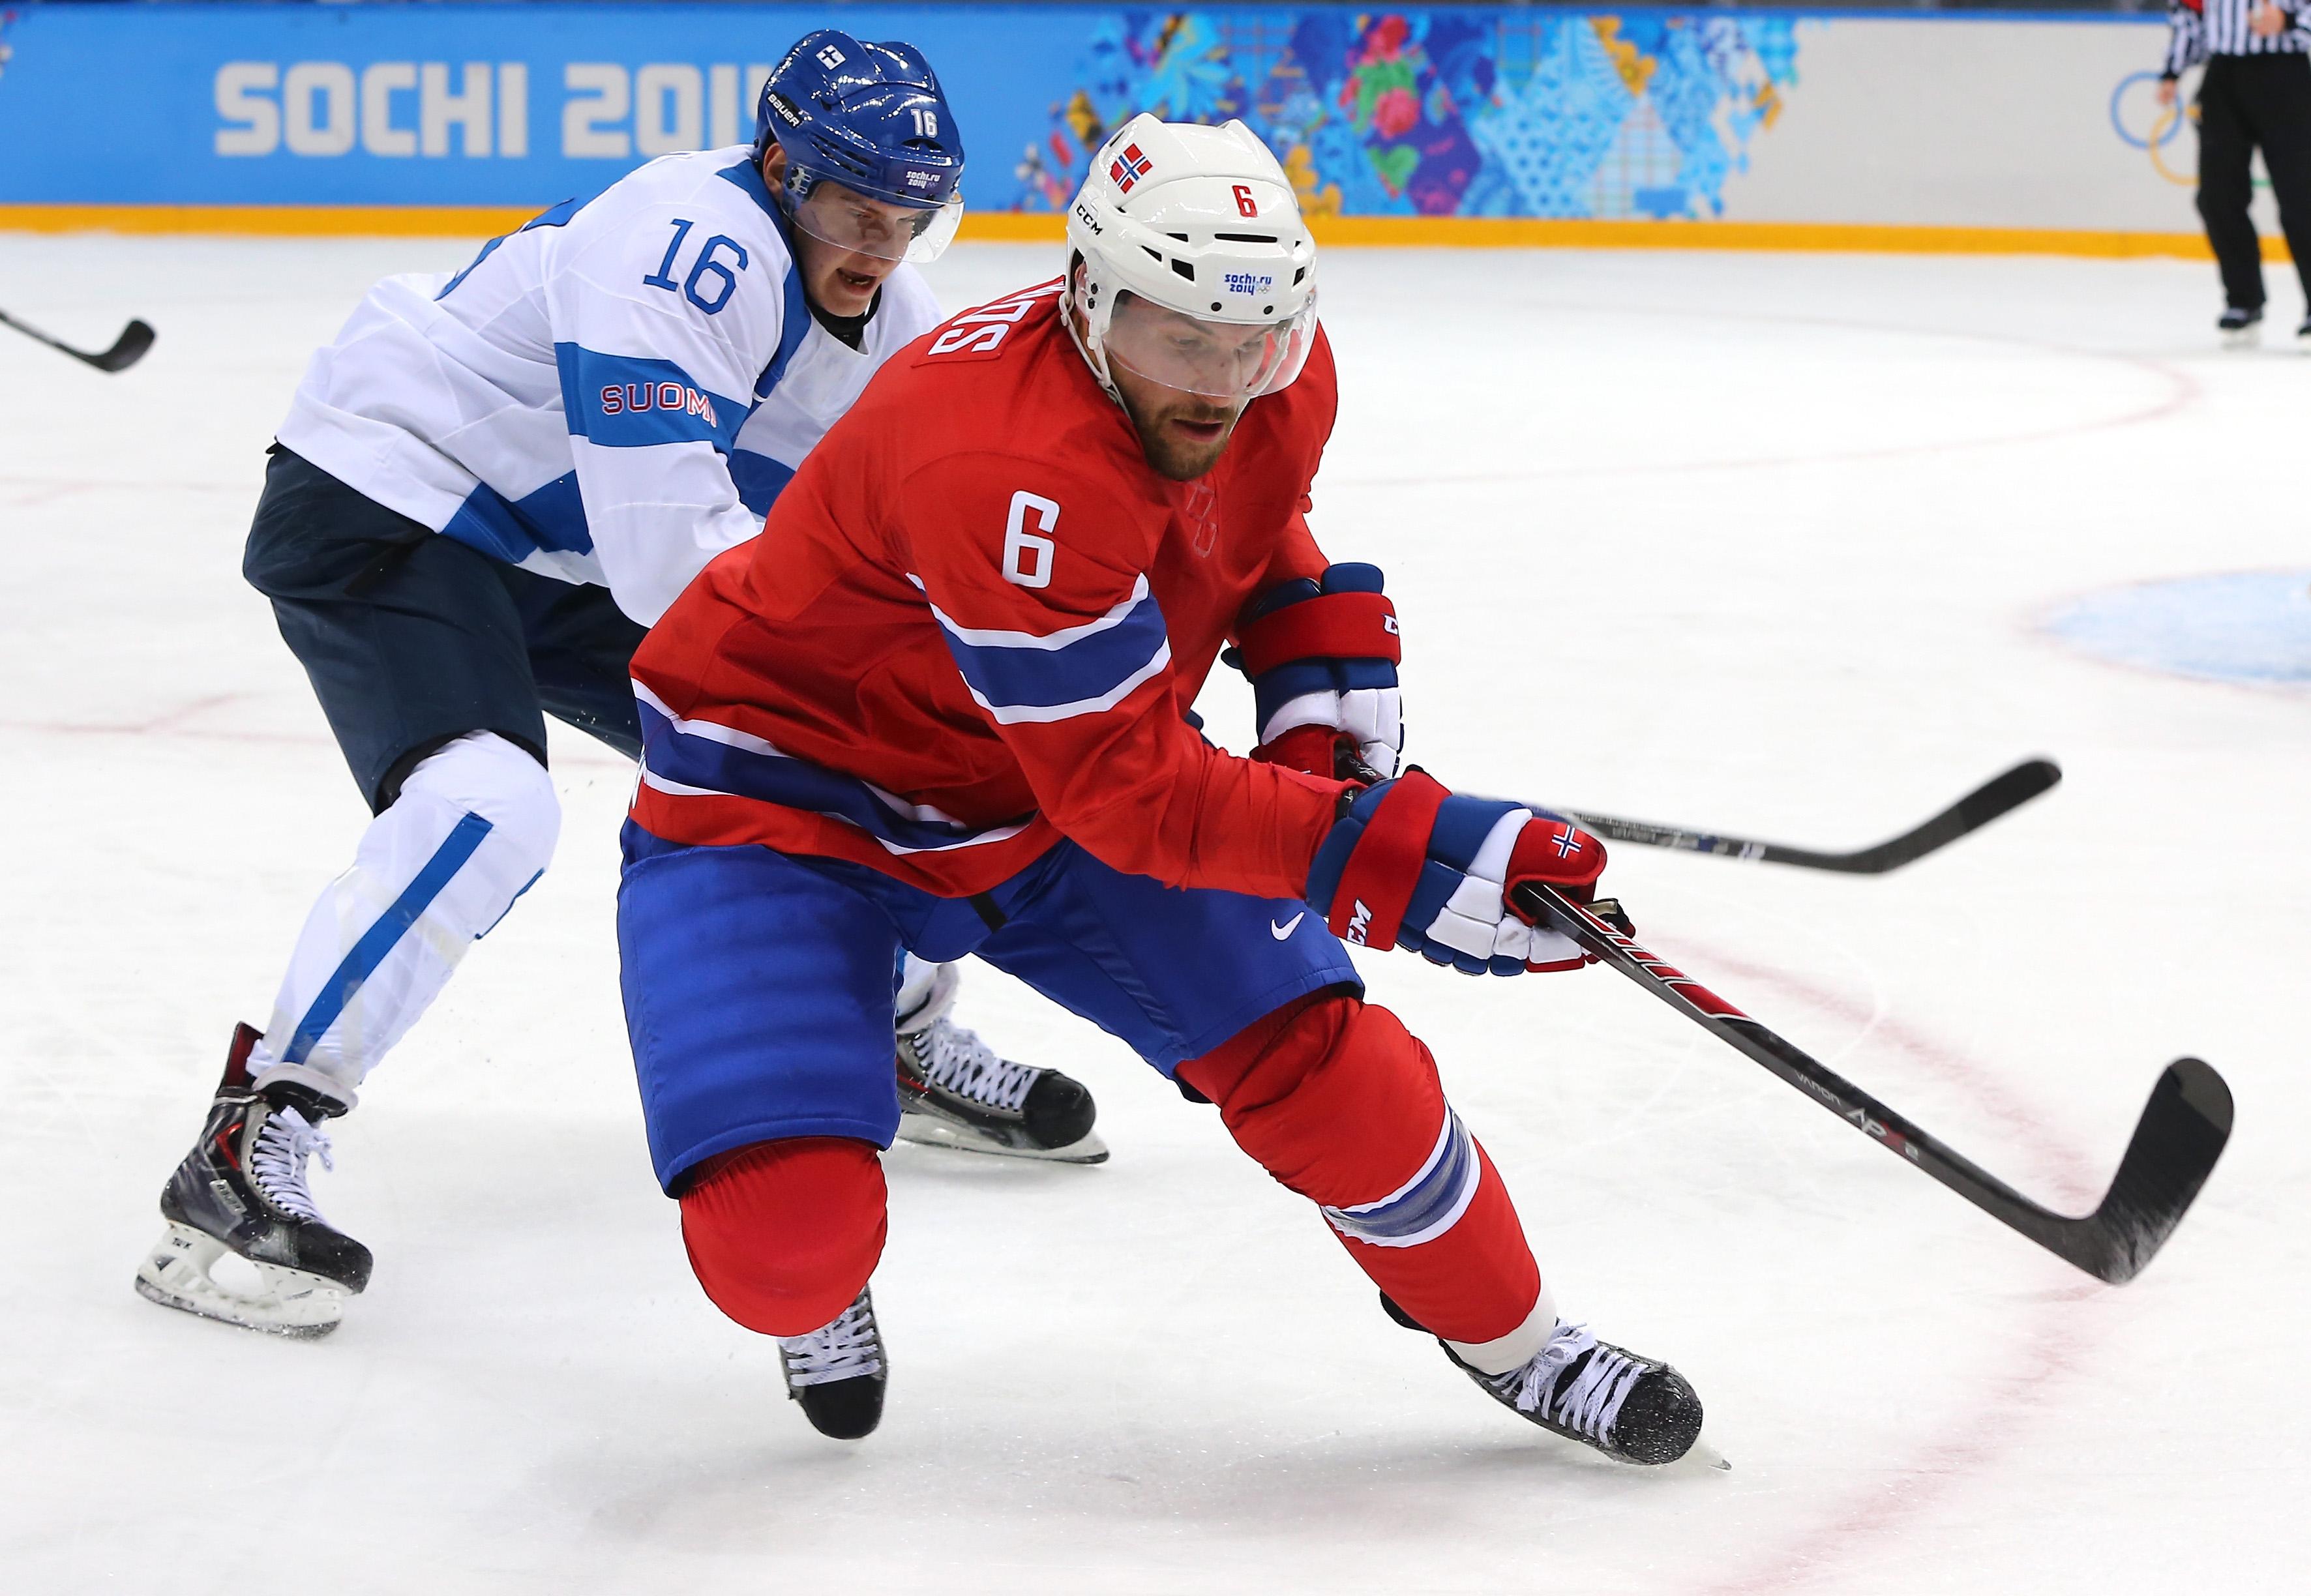 Aleksander Barkov väänsi polvensa ottelussa Norjaa vastaan (Getty images)